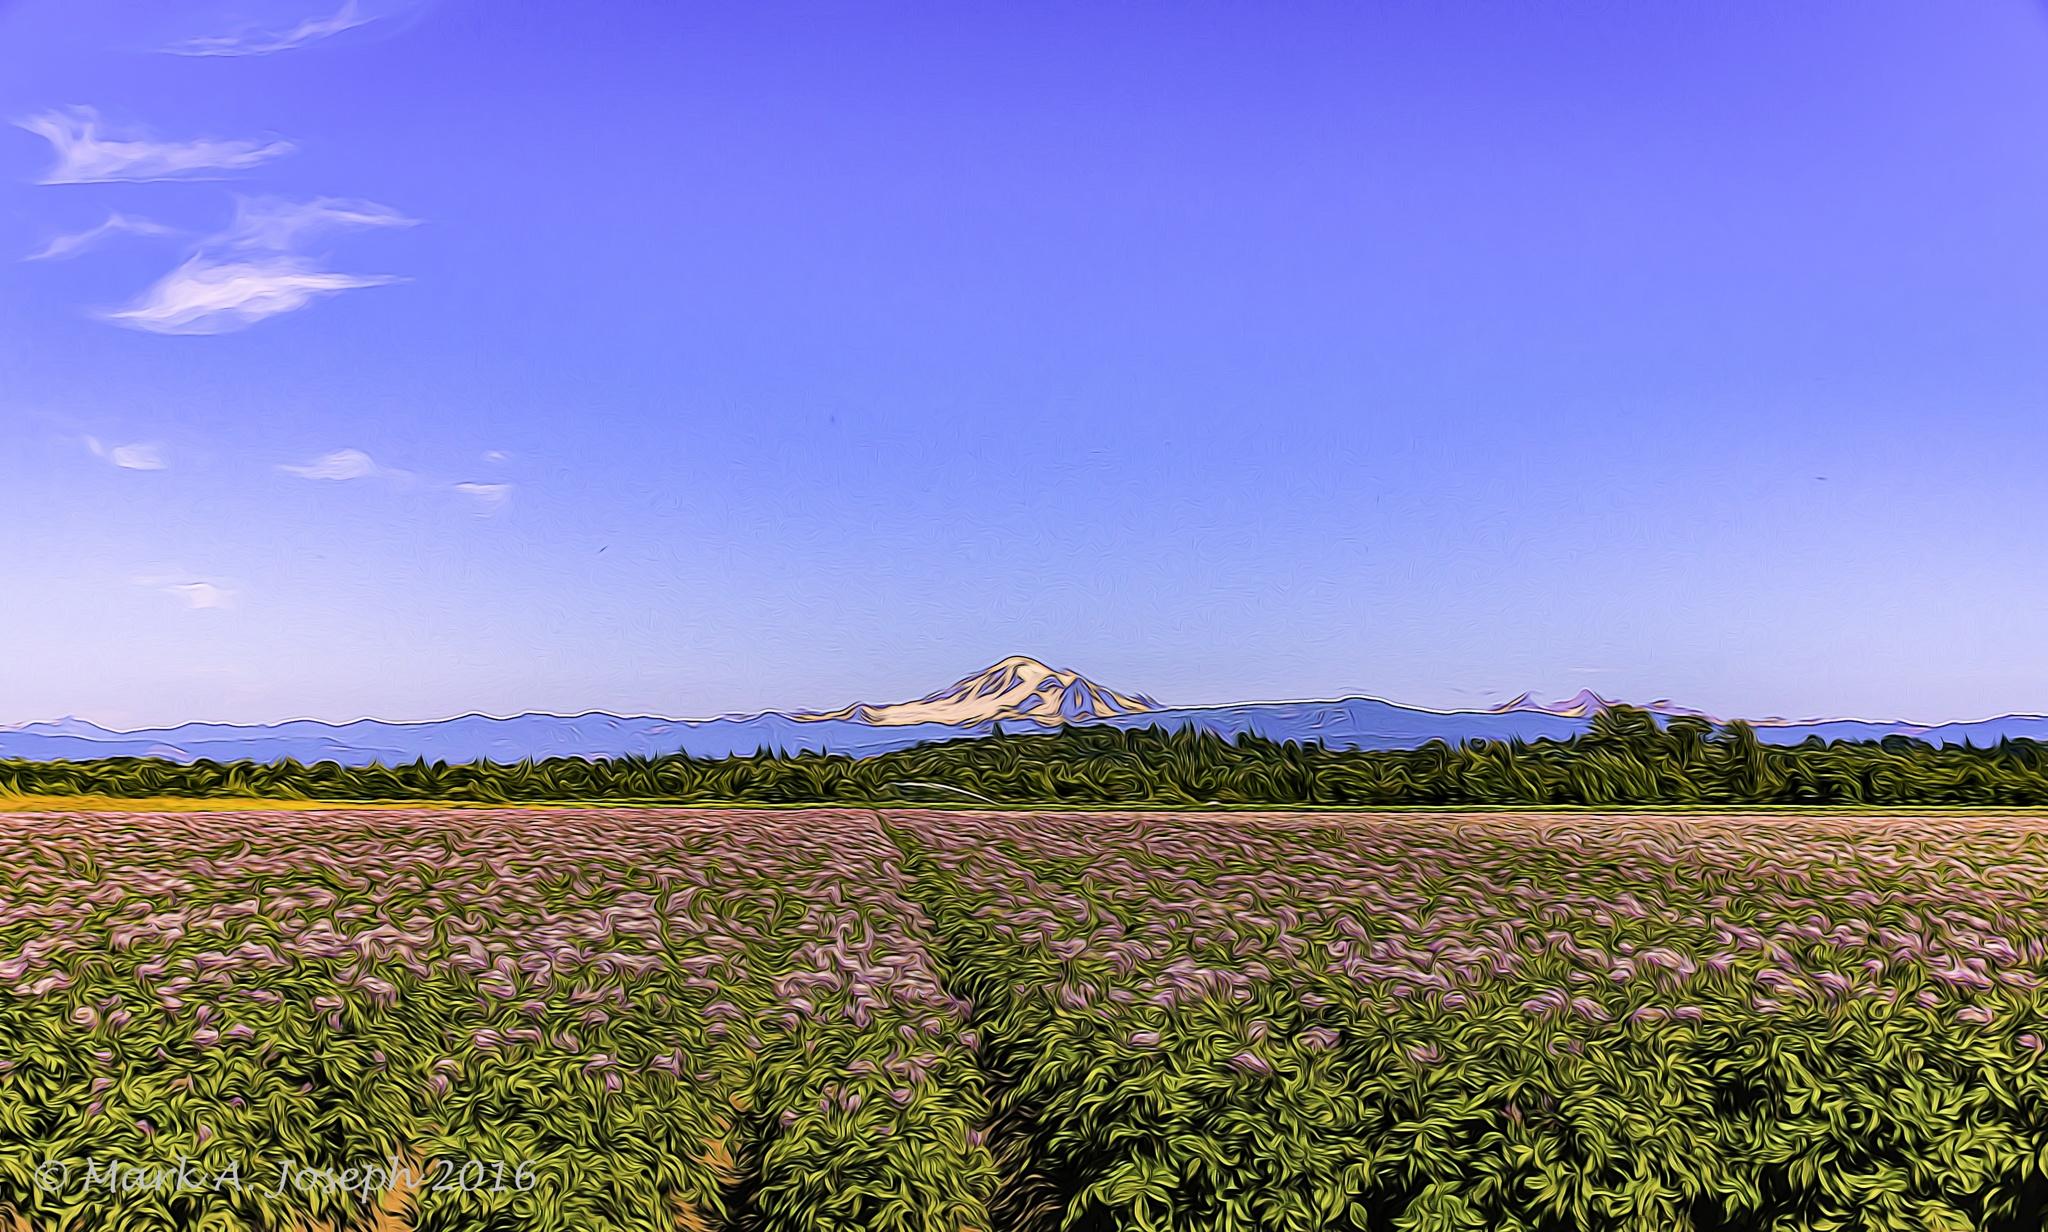 Field of Potatoes by Mark Joseph